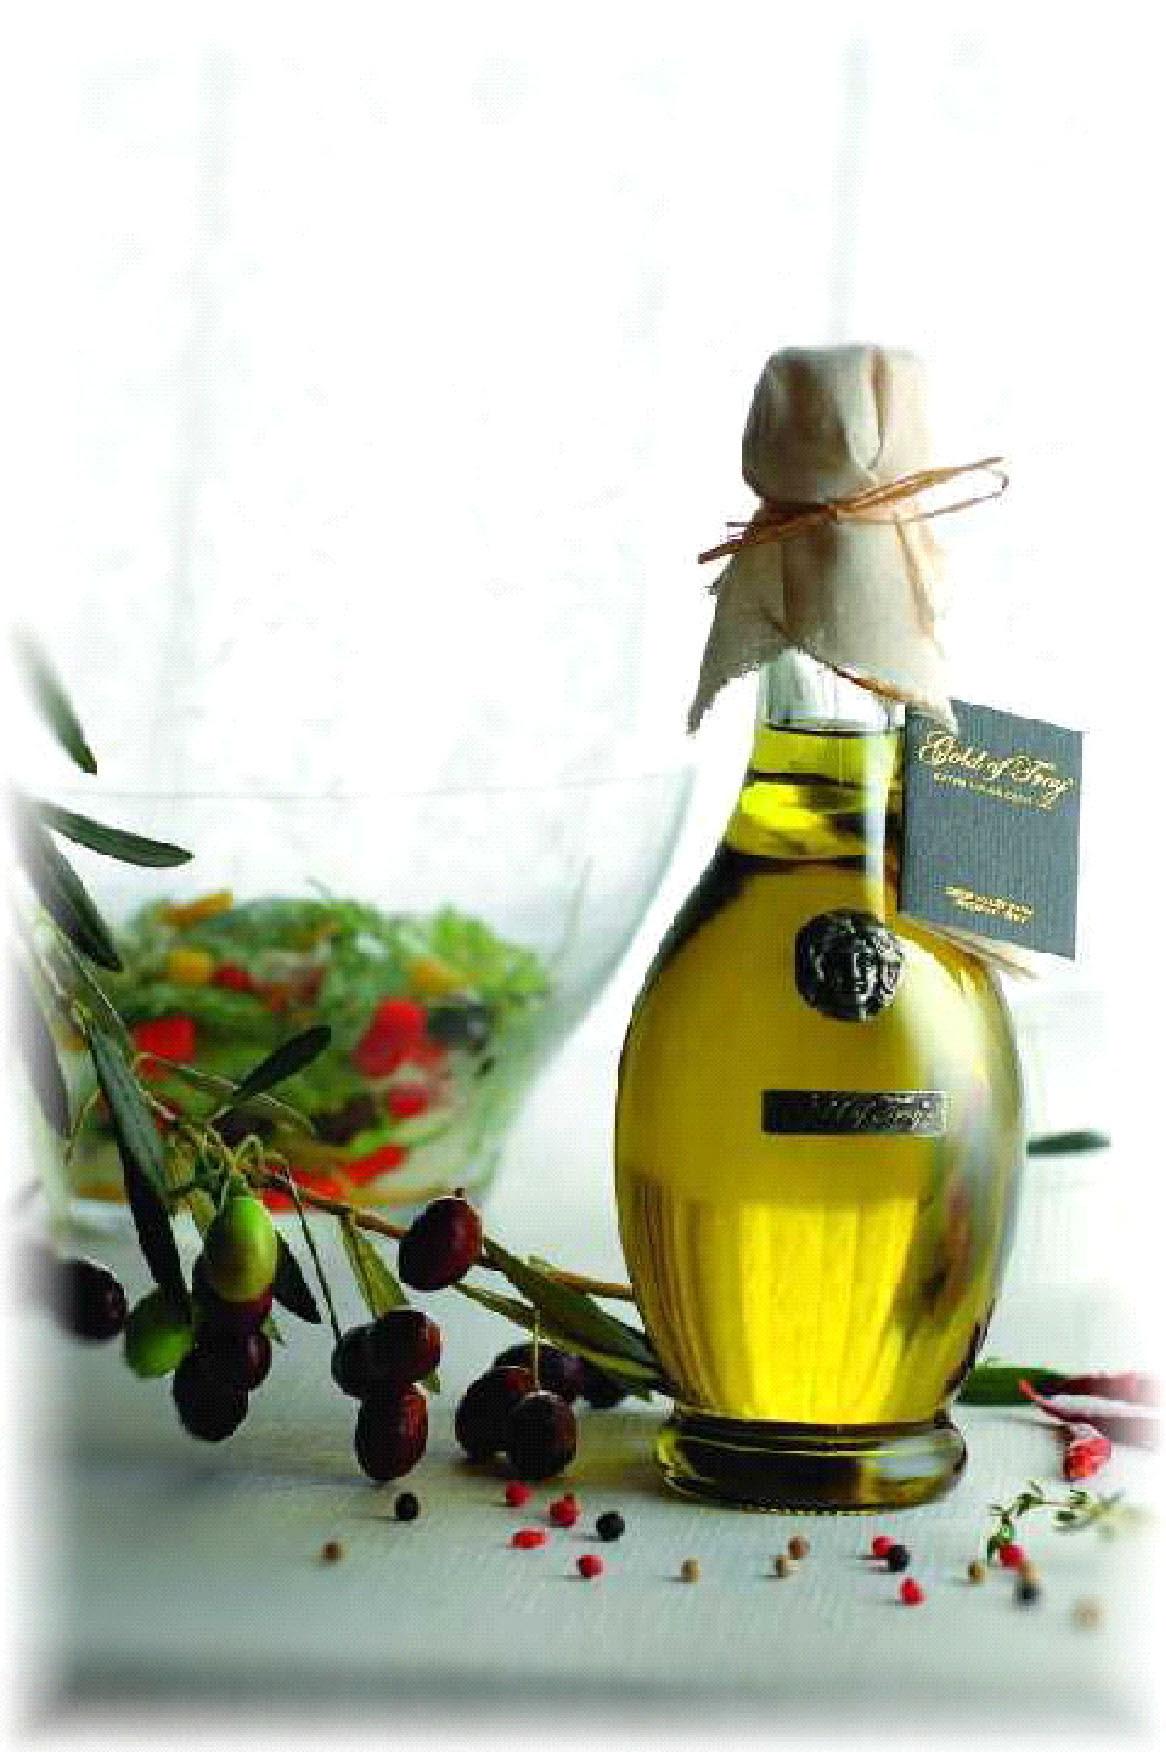 http://billieariian.files.wordpress.com/2011/03/olive-oil.jpg